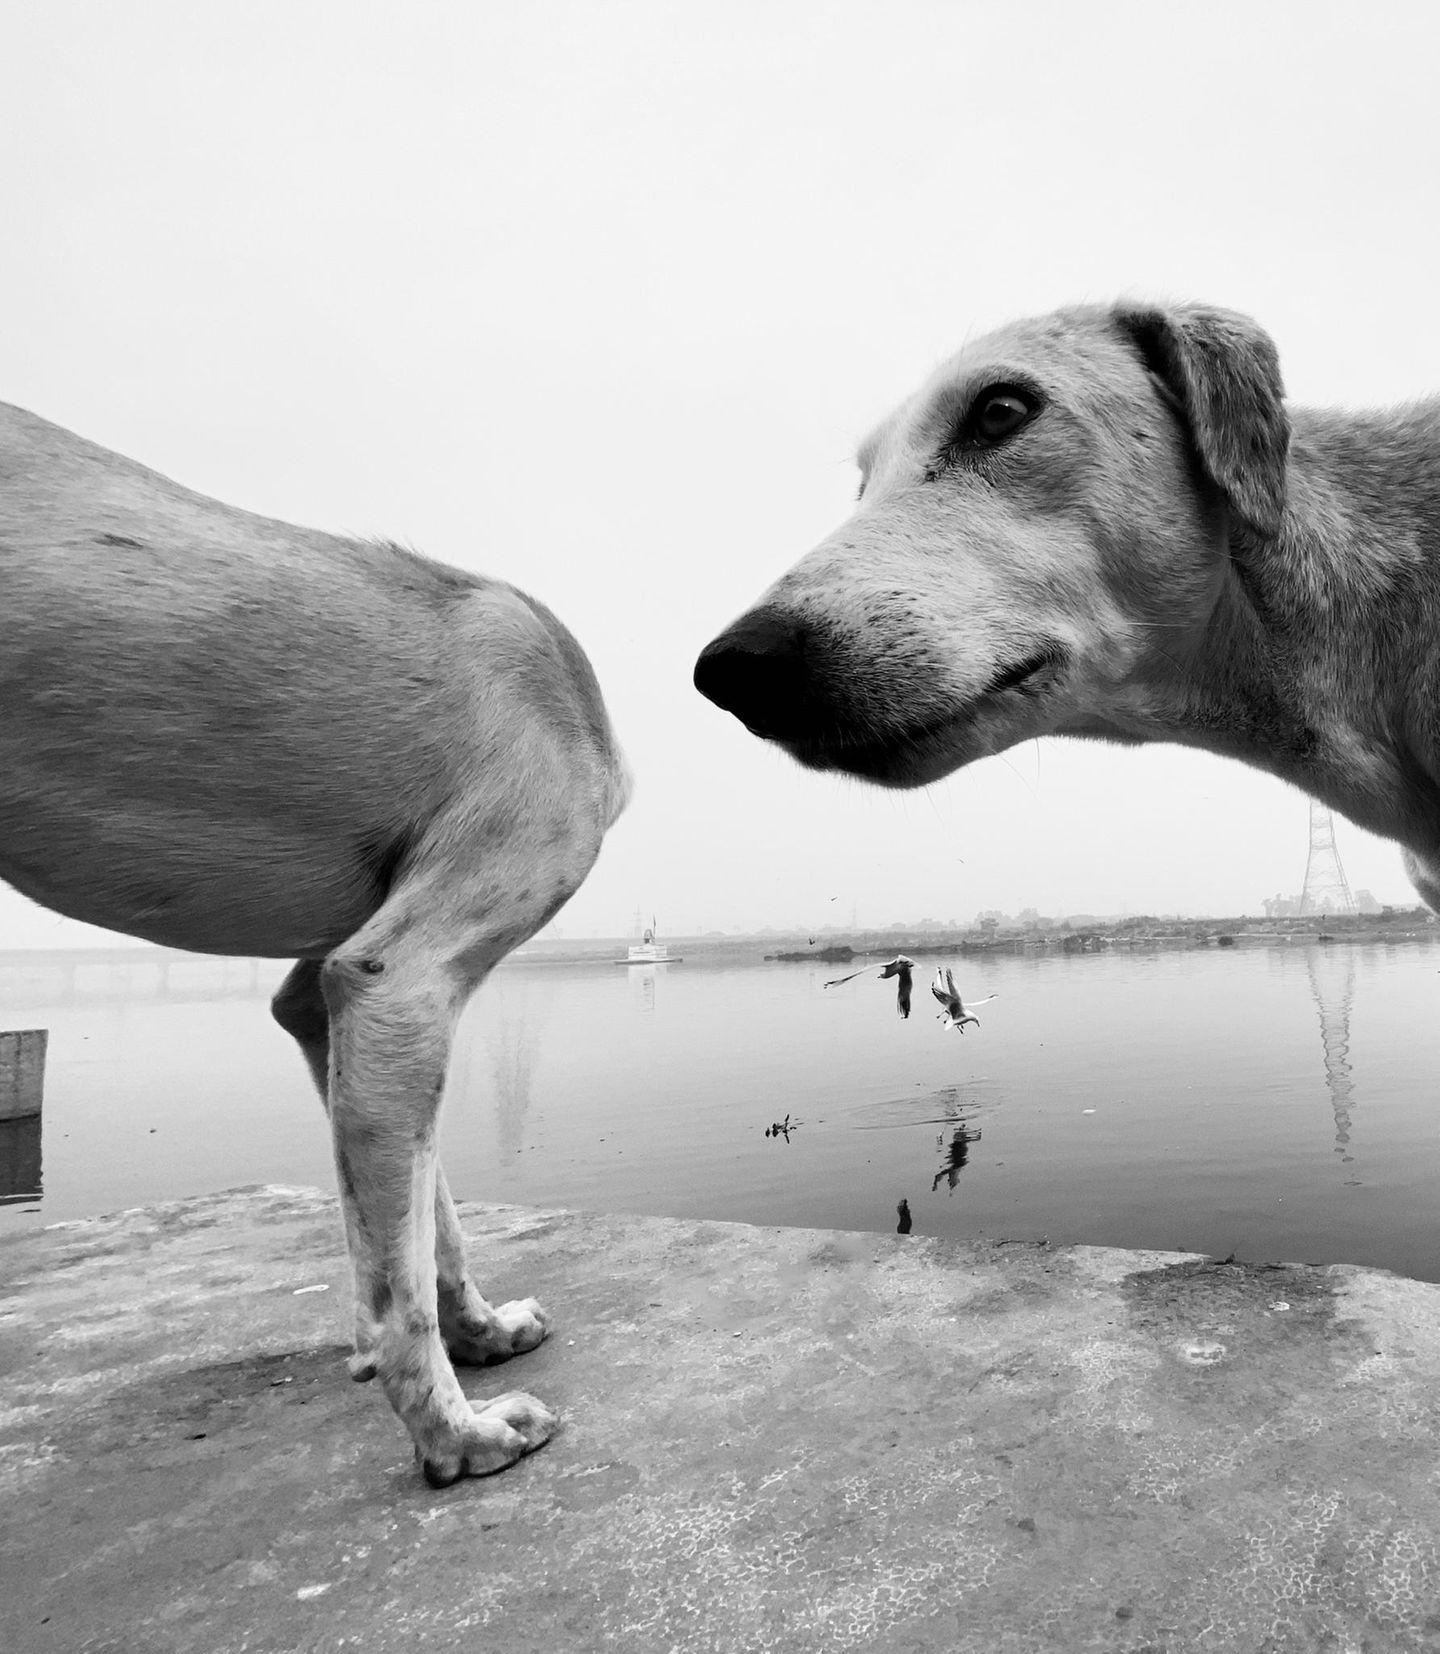 Haustier Fotowettbewerb: Hunde am See